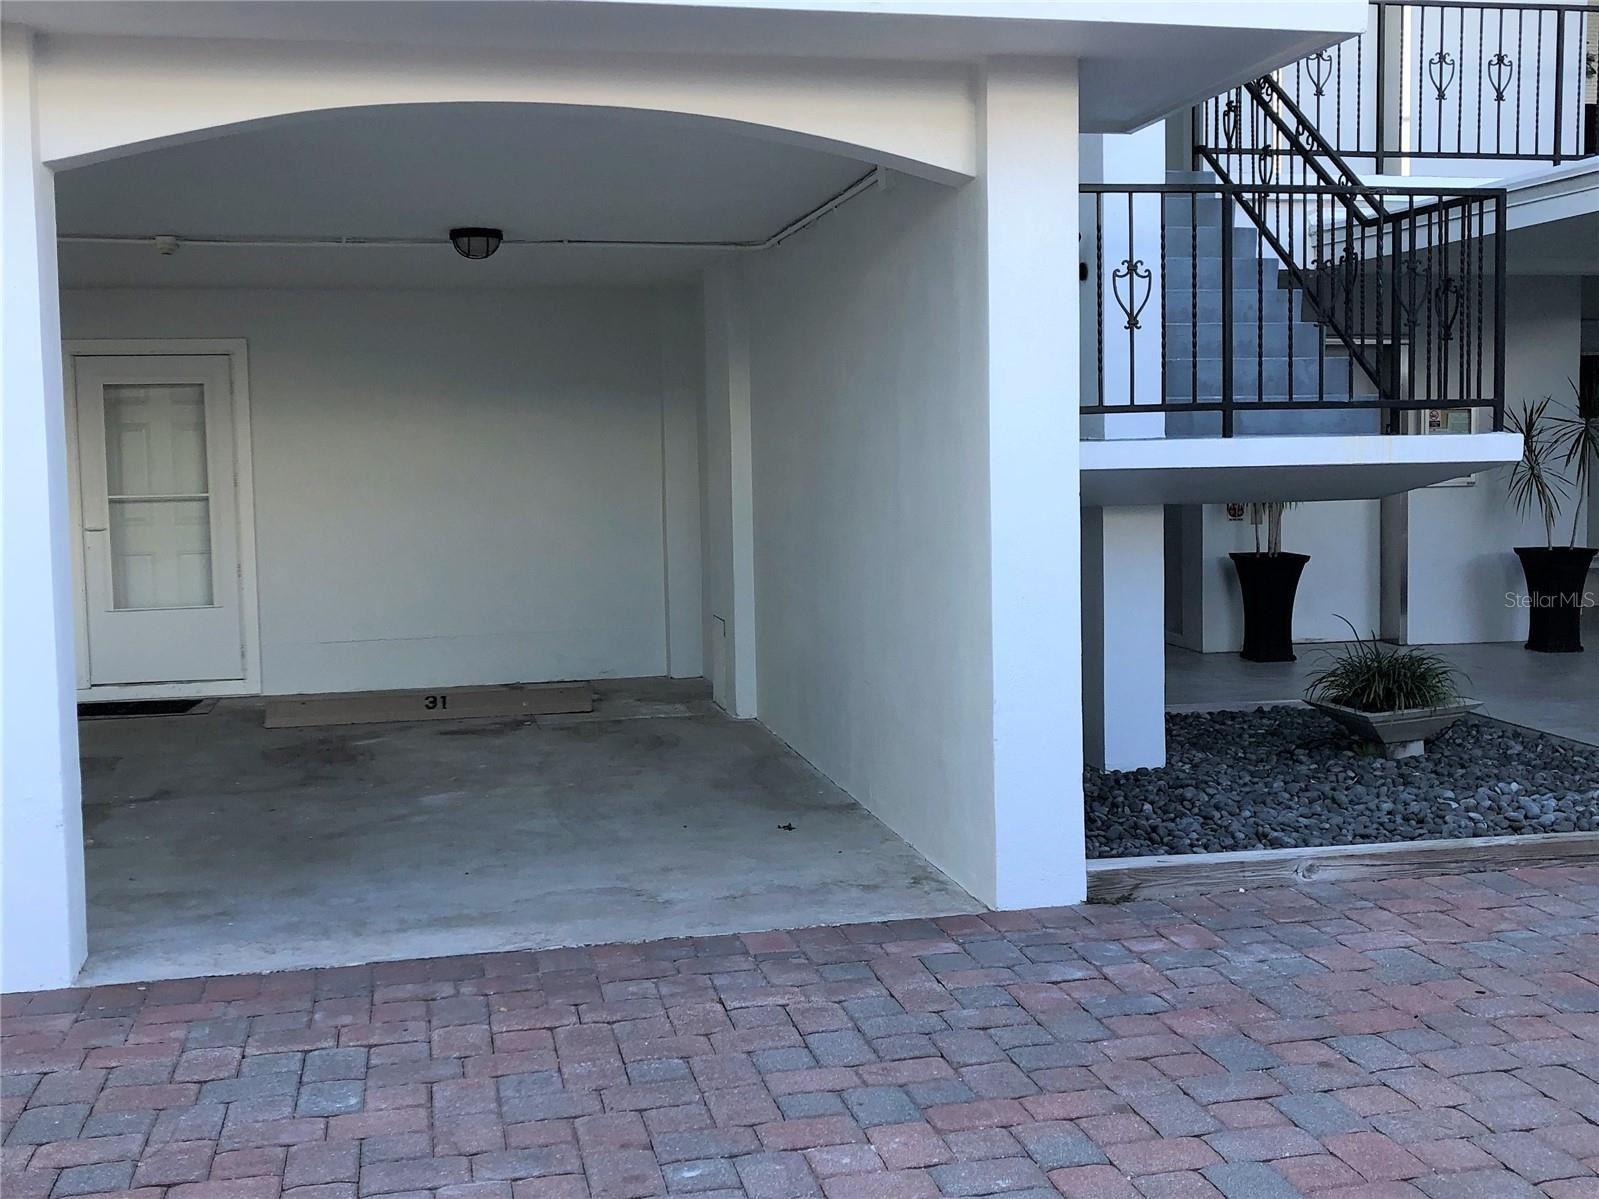 Photo of 174 GOLDEN GATE POINT #31, SARASOTA, FL 34236 (MLS # A4503866)